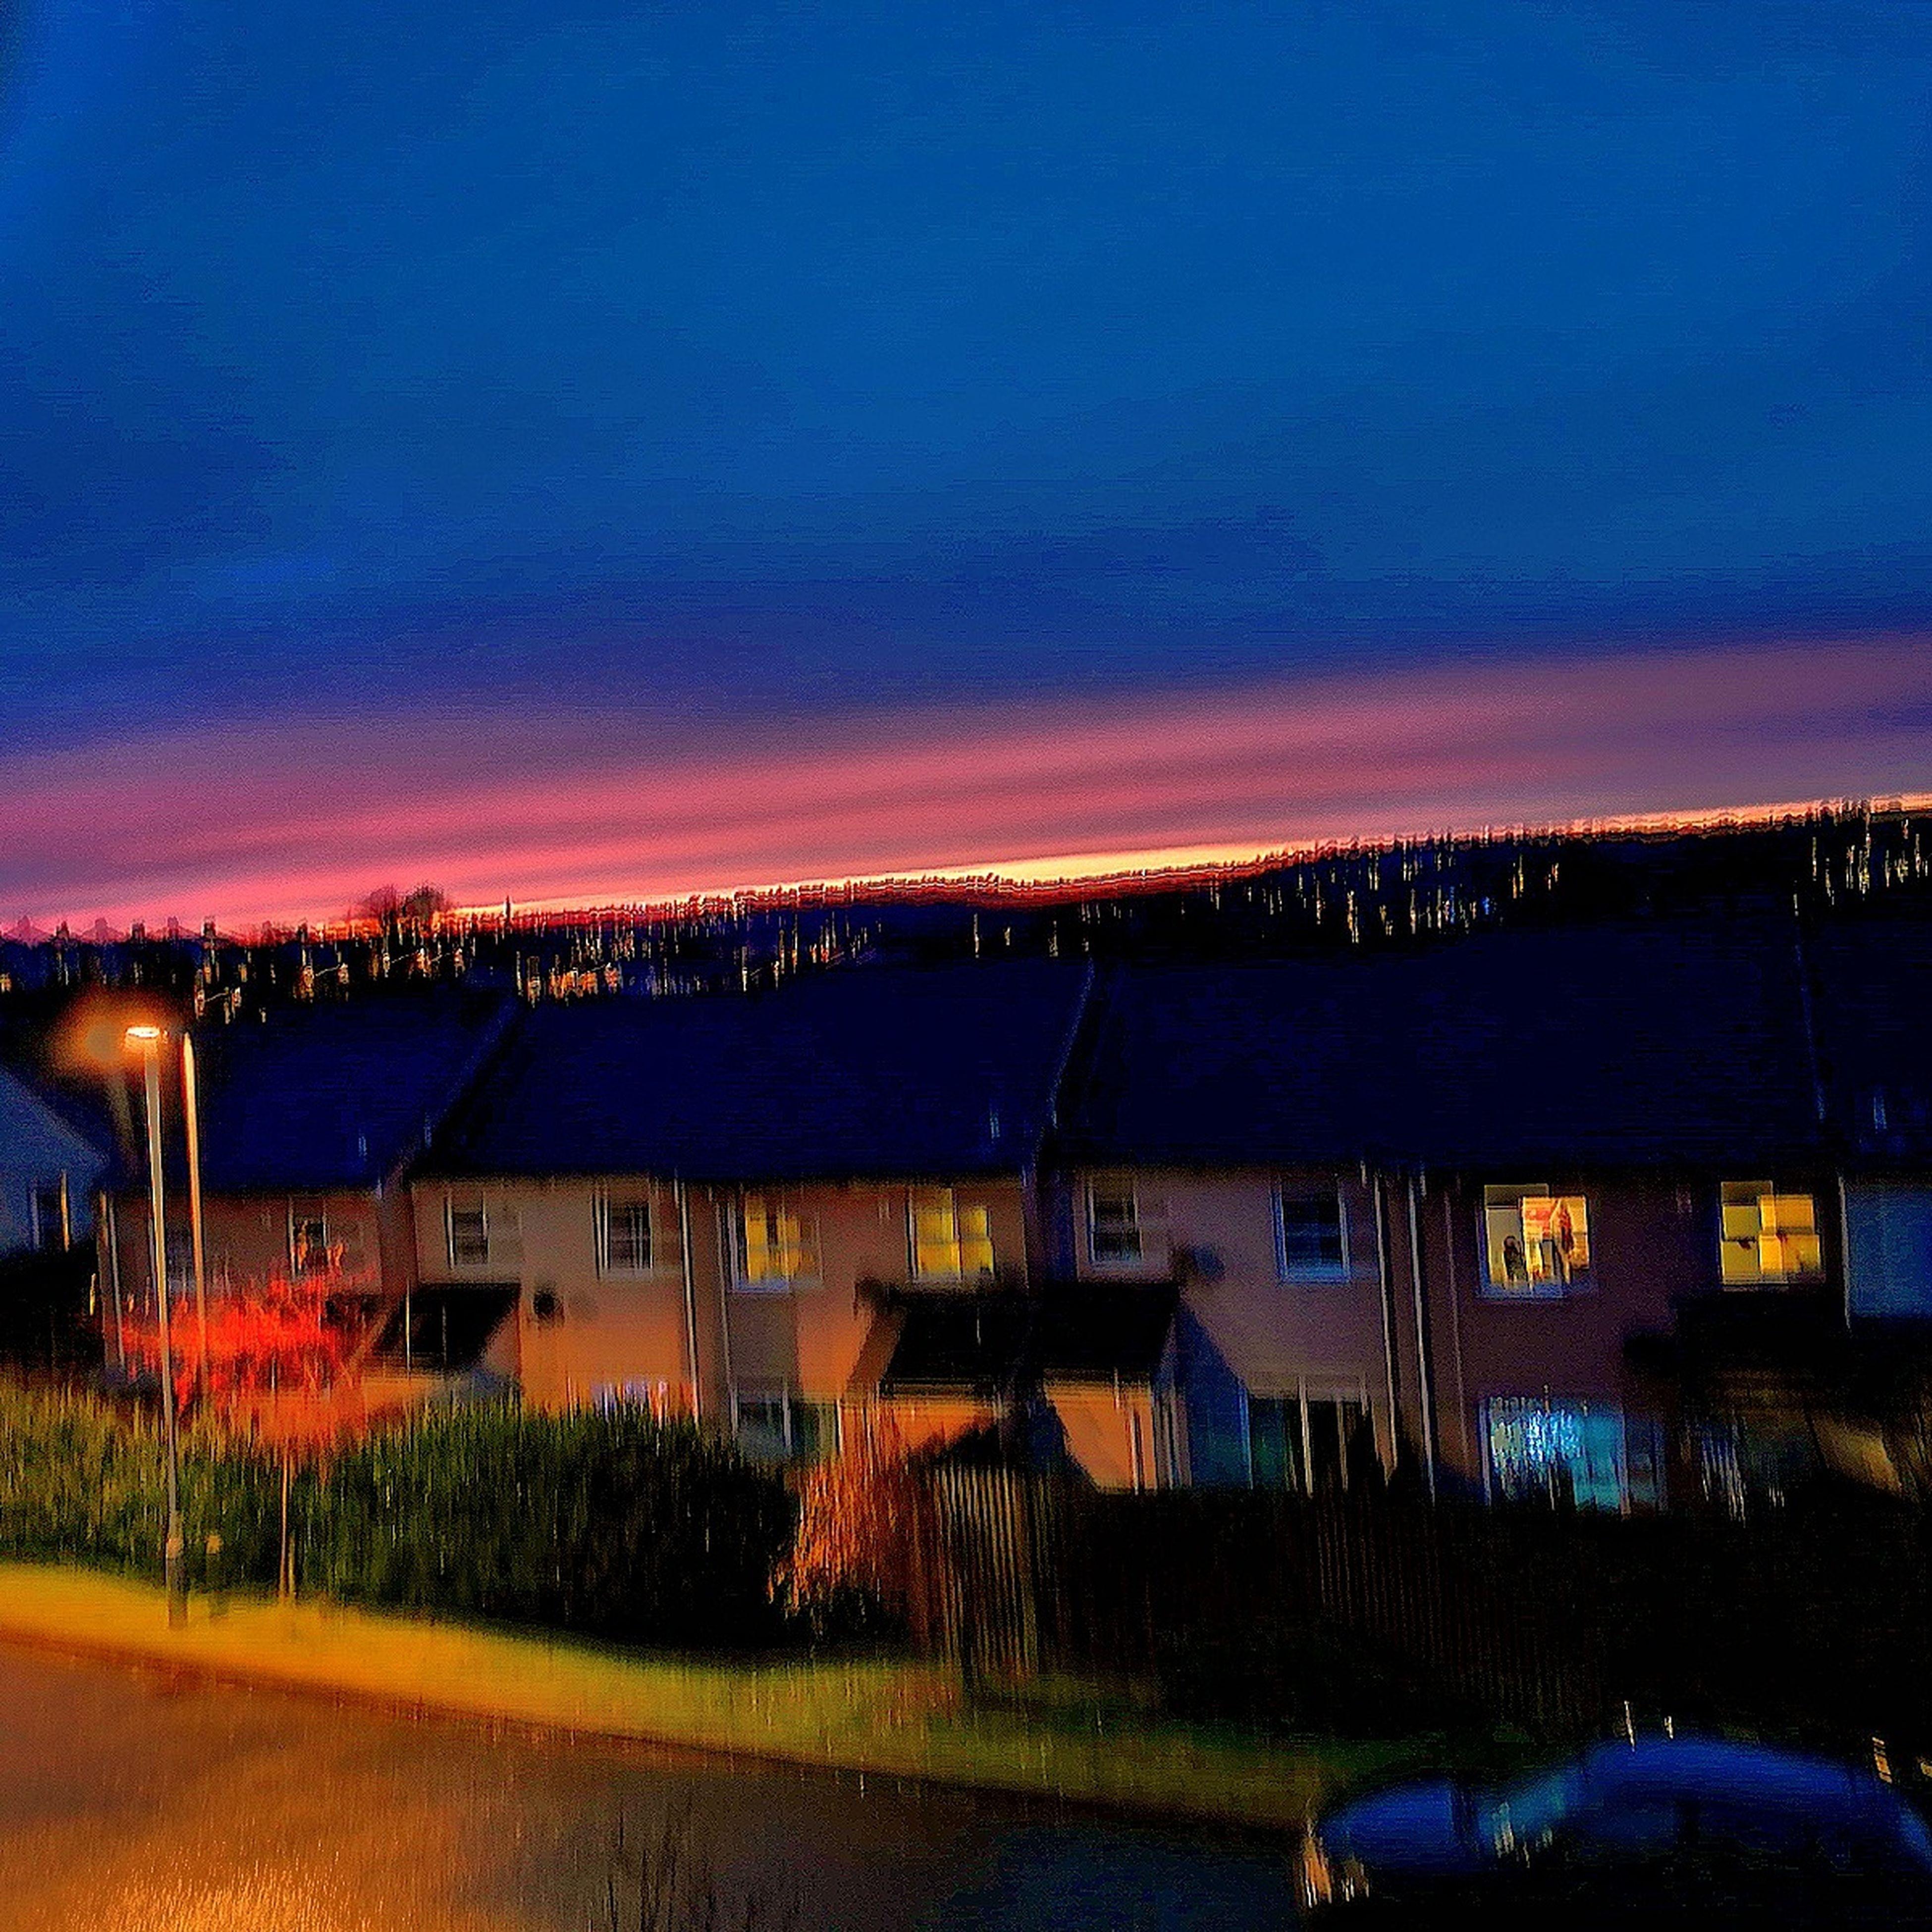 night, illuminated, architecture, sky, road, outdoors, neon, stadium, milky way, star - space, galaxy, no people